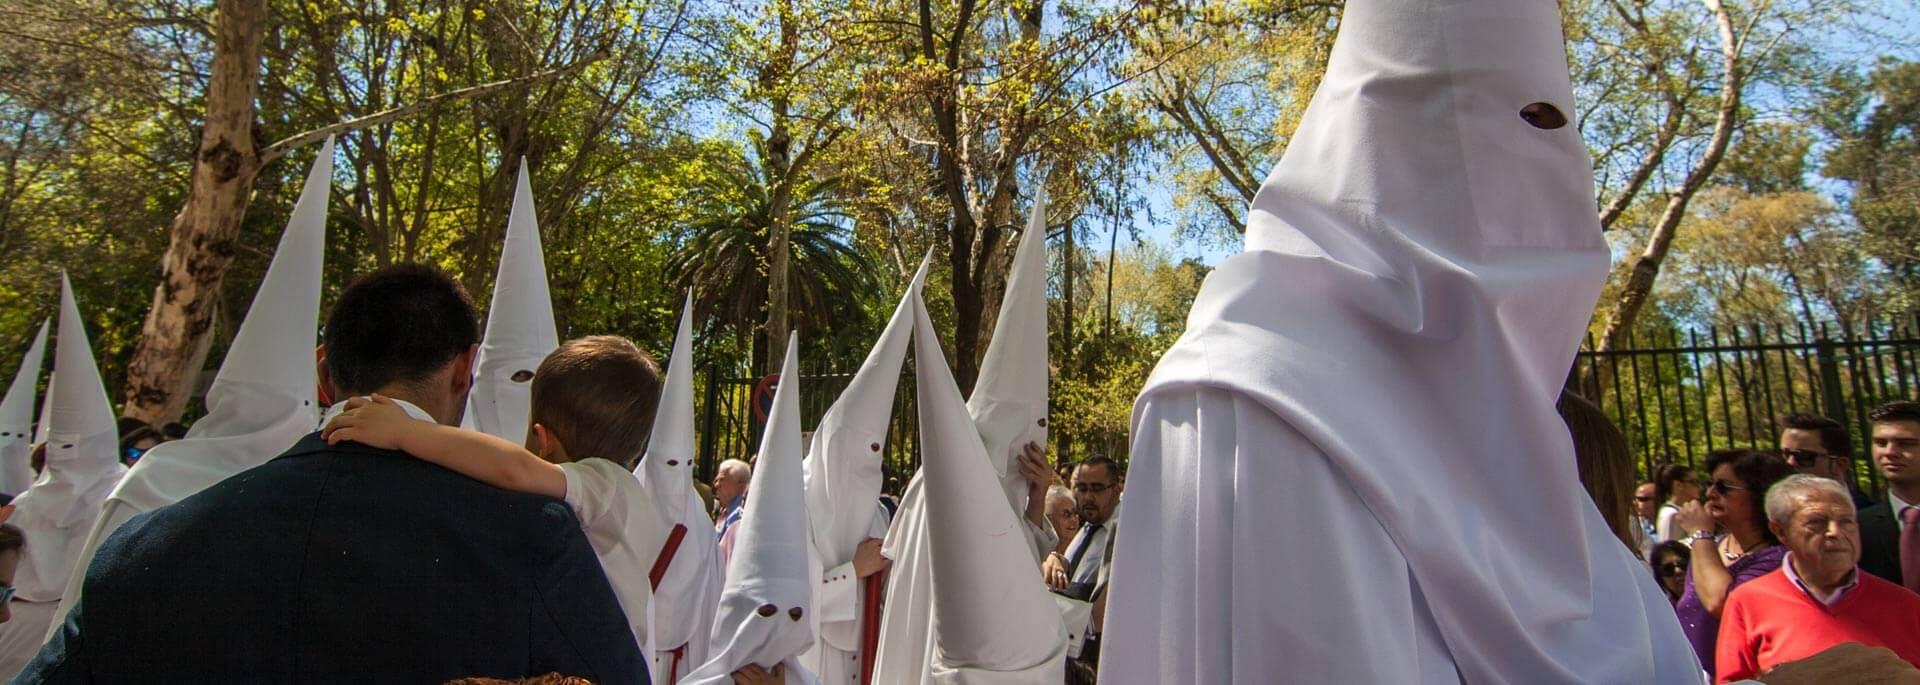 Reisetipp: Zur Semana Santa nach Sevilla